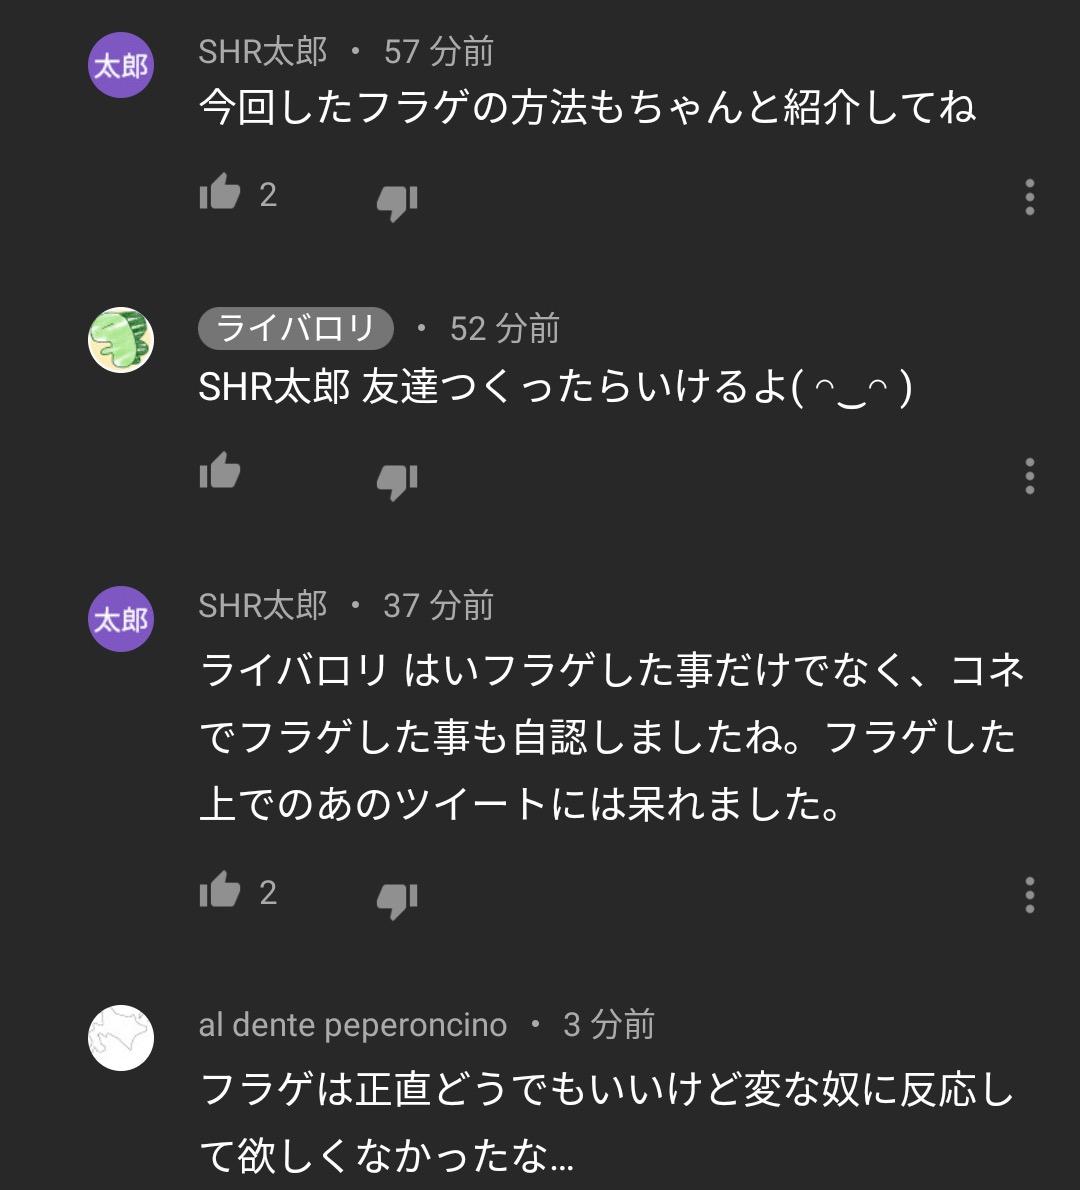 YO8Ds4j - 【悲報】ポケモン実況者ライバロリさん、フラゲがバレてイライラ